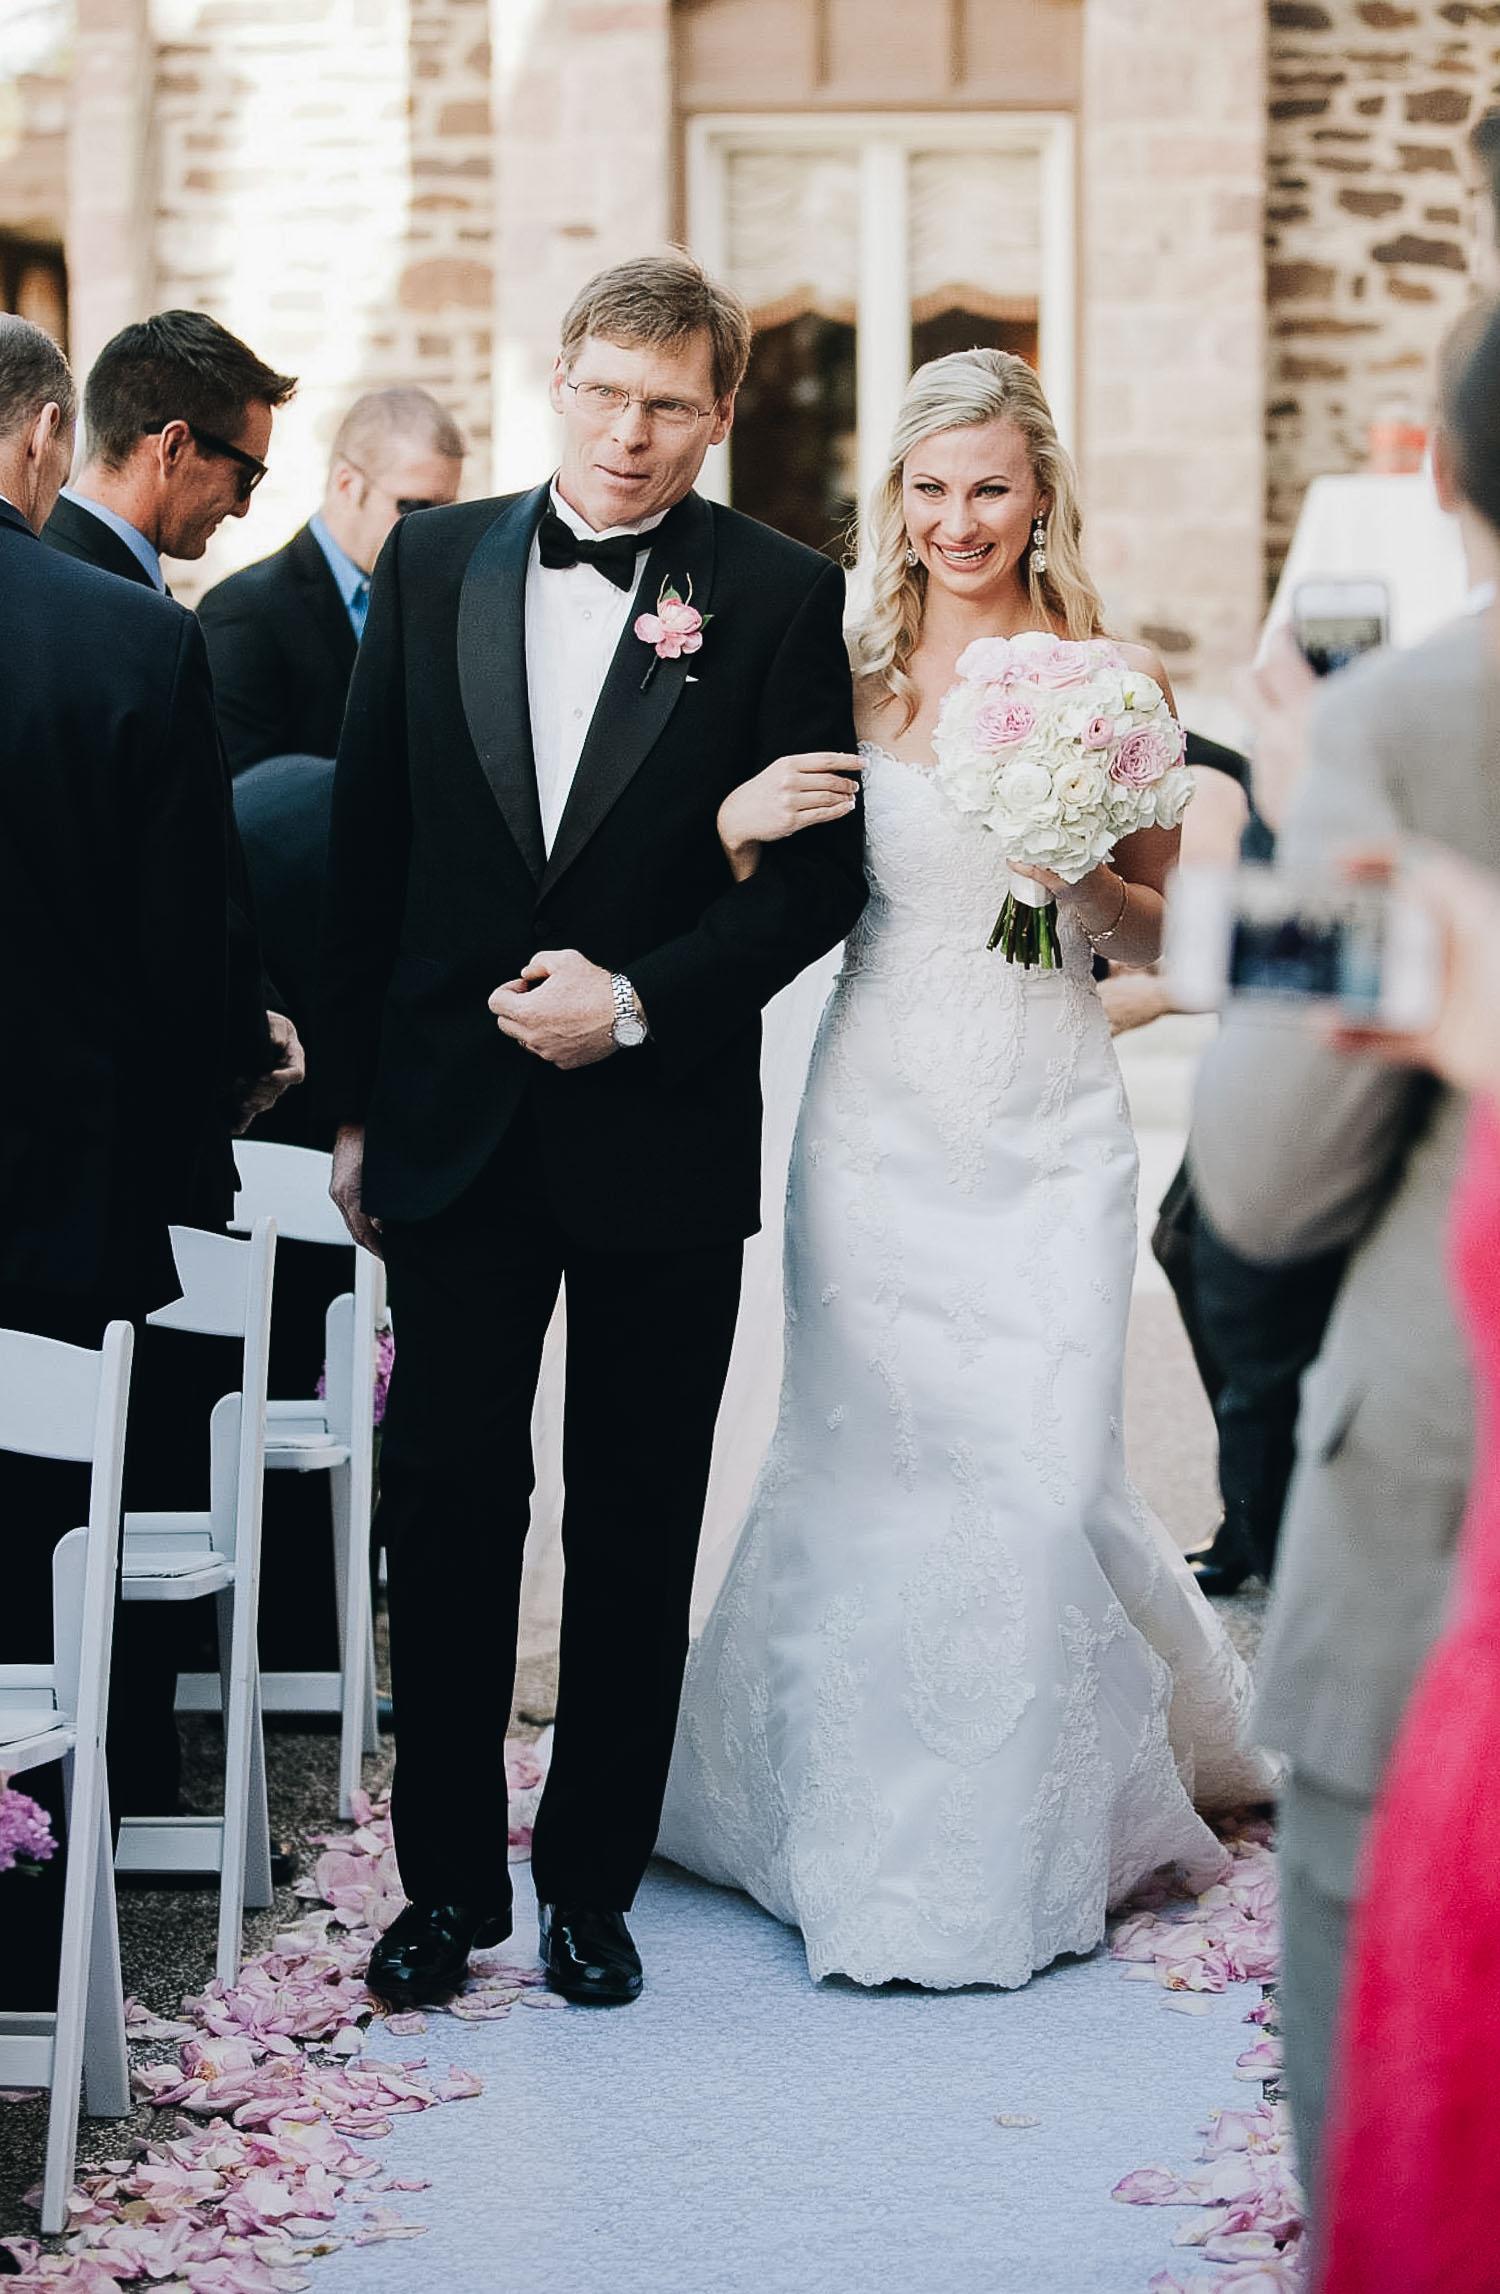 JMPHOTOART-Wedding-Photographer-122.jpg